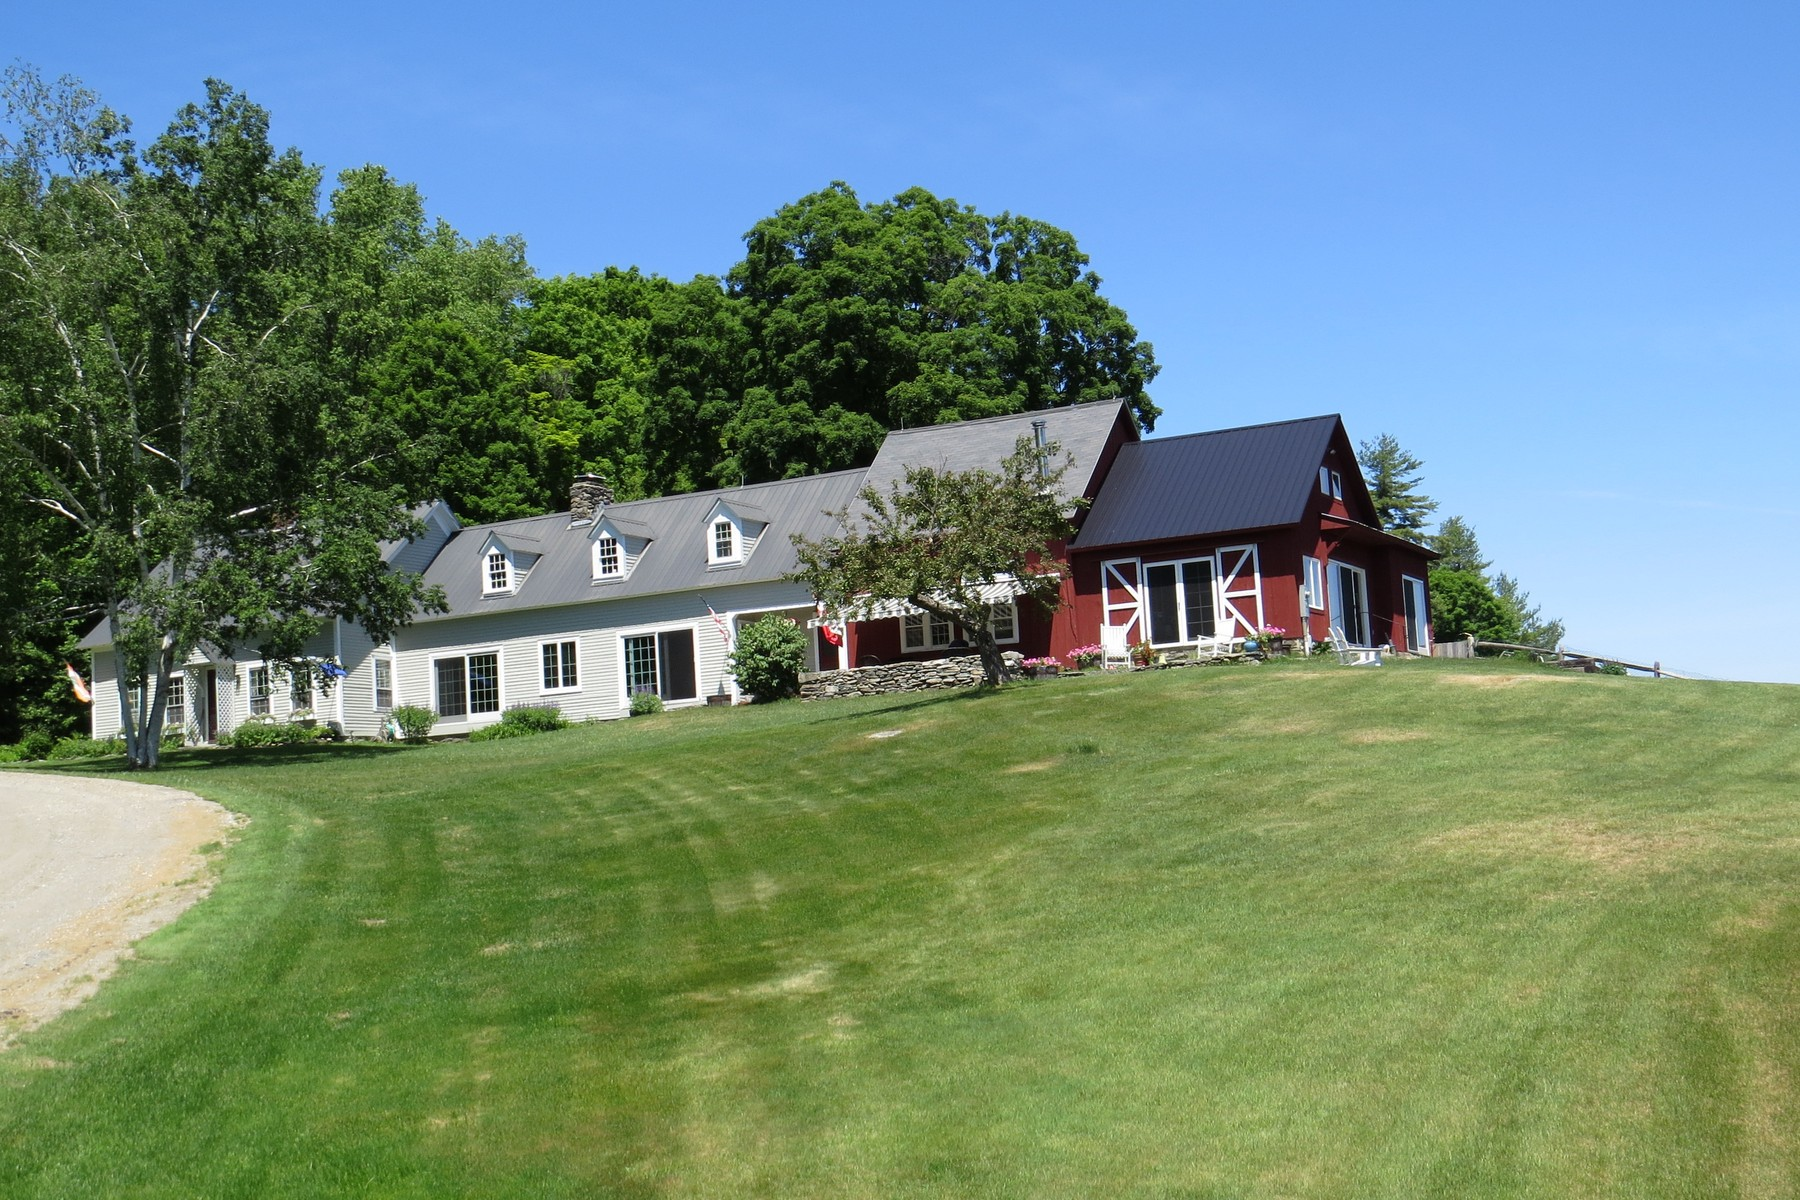 Casa para uma família para Venda às Mountain View Farmstead 452 Carley Ln Londonderry, Vermont, 05155 Estados Unidos